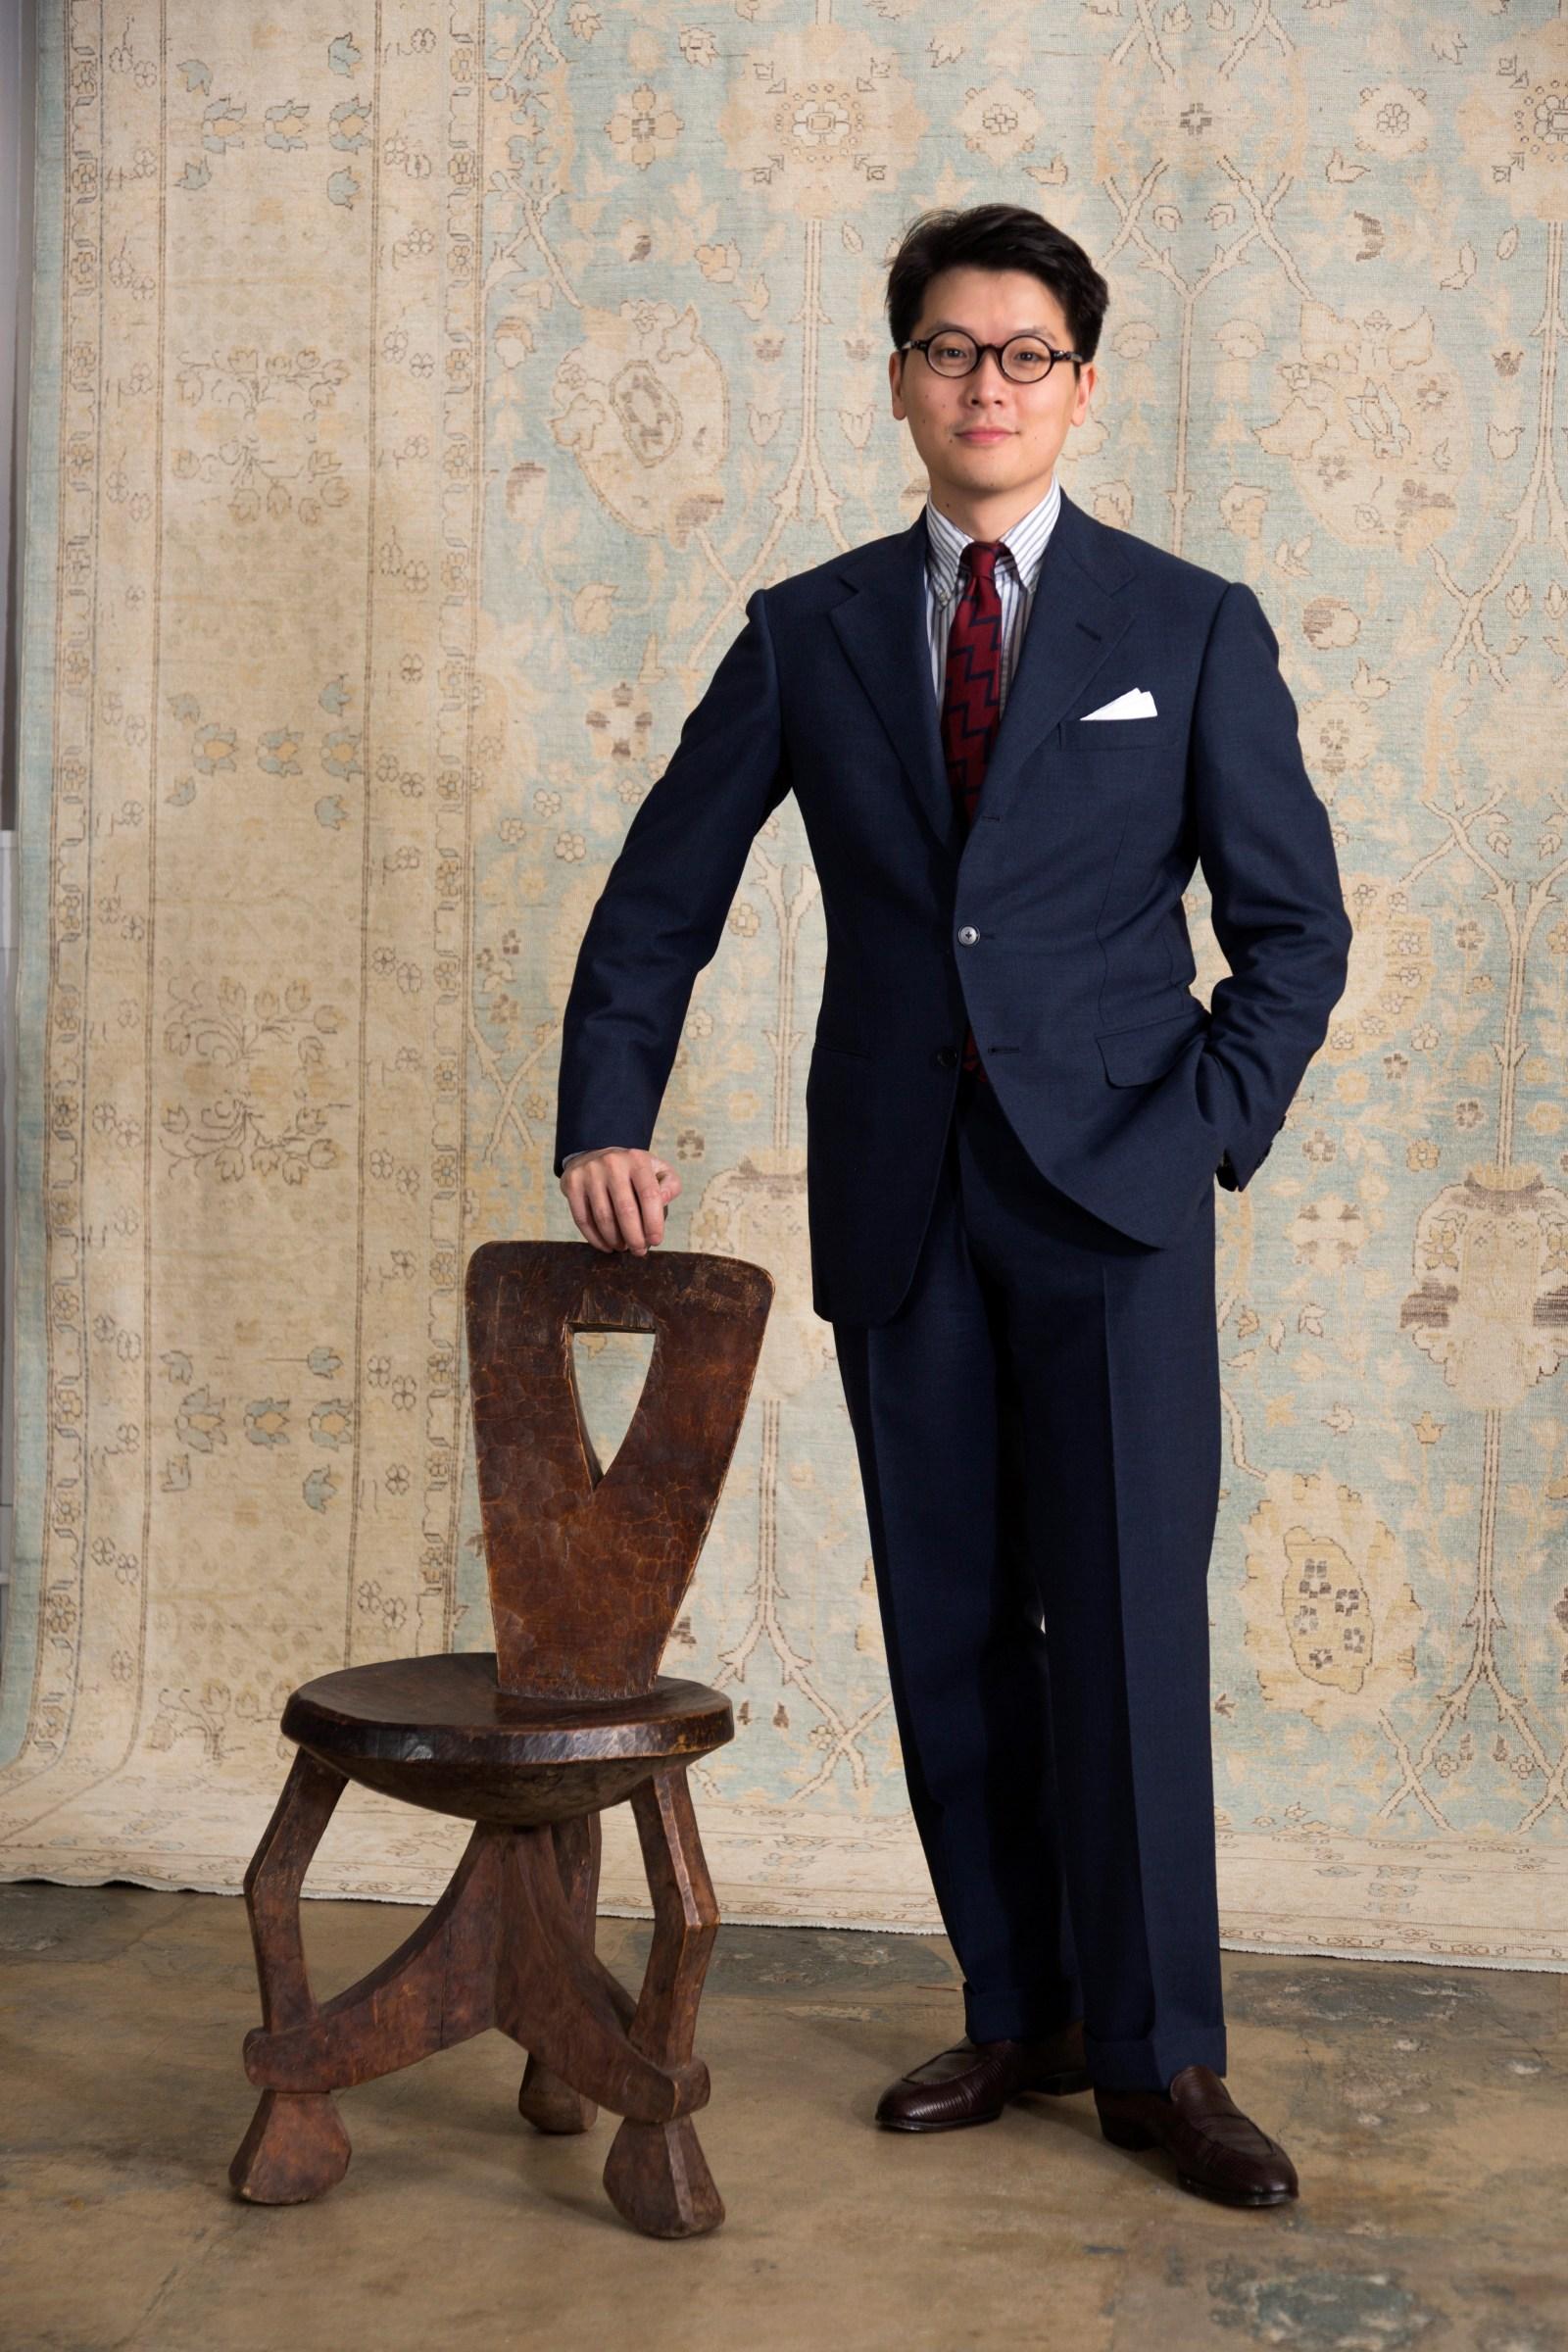 oversized suit